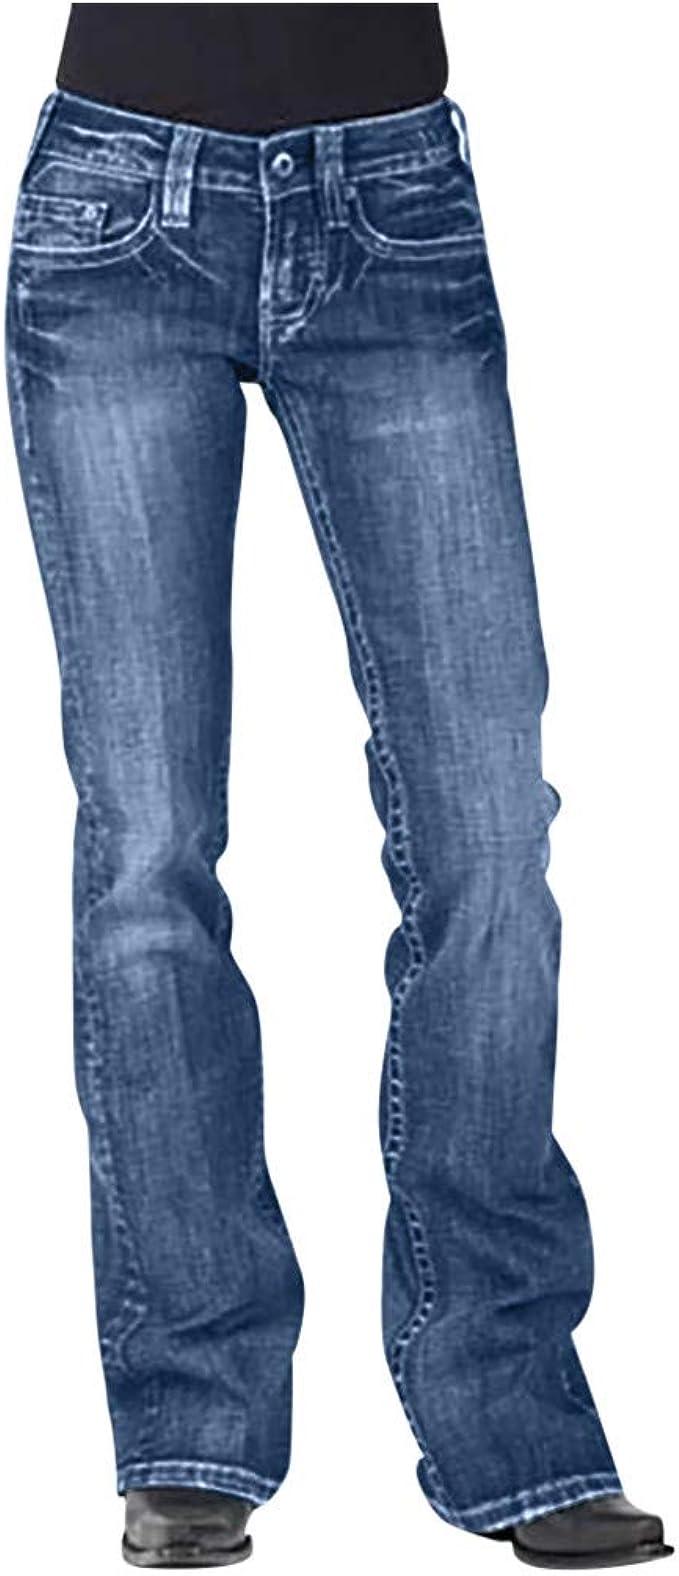 Leichte Sommerhose Shorts Kurze Hose in Unifarben Komfortable Pants Sporthose AIORNIY Damen Spitze Hotpants mit Gummizug